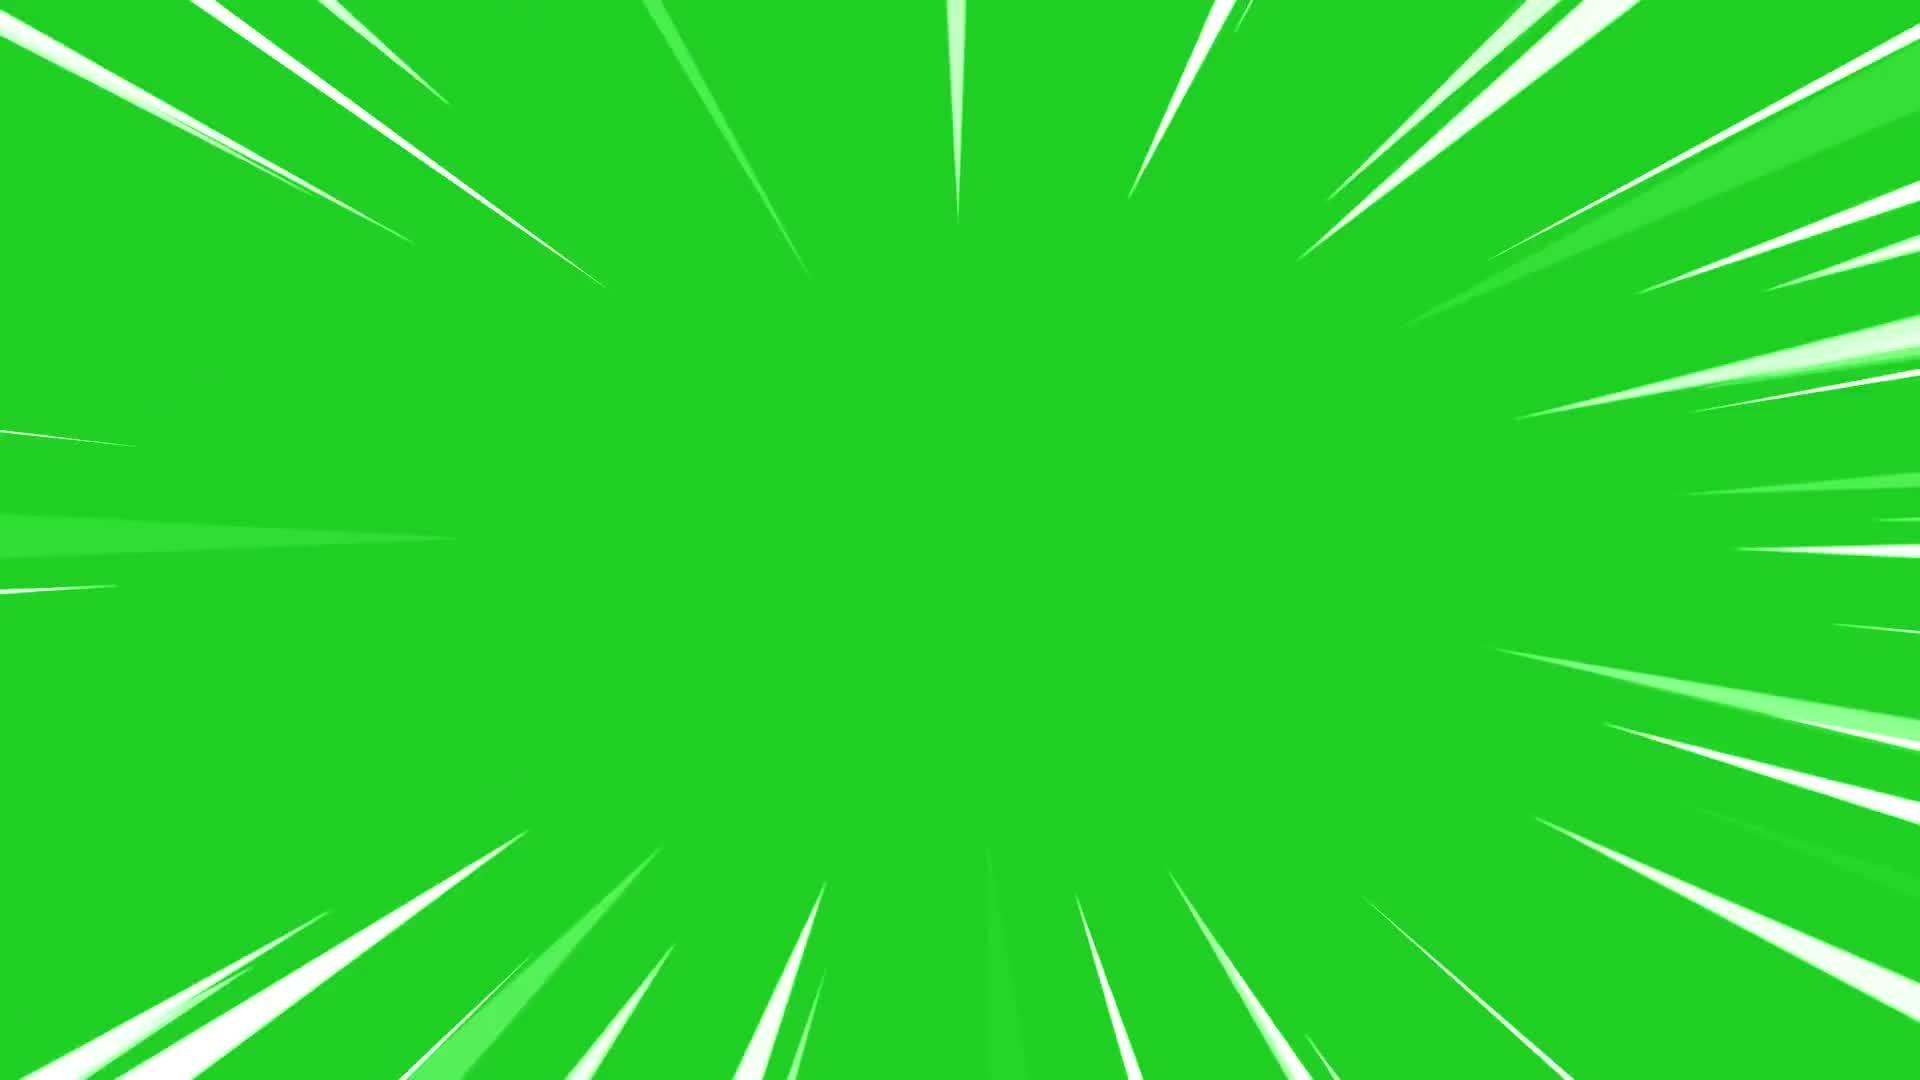 Anime Zoom Greenscreen.